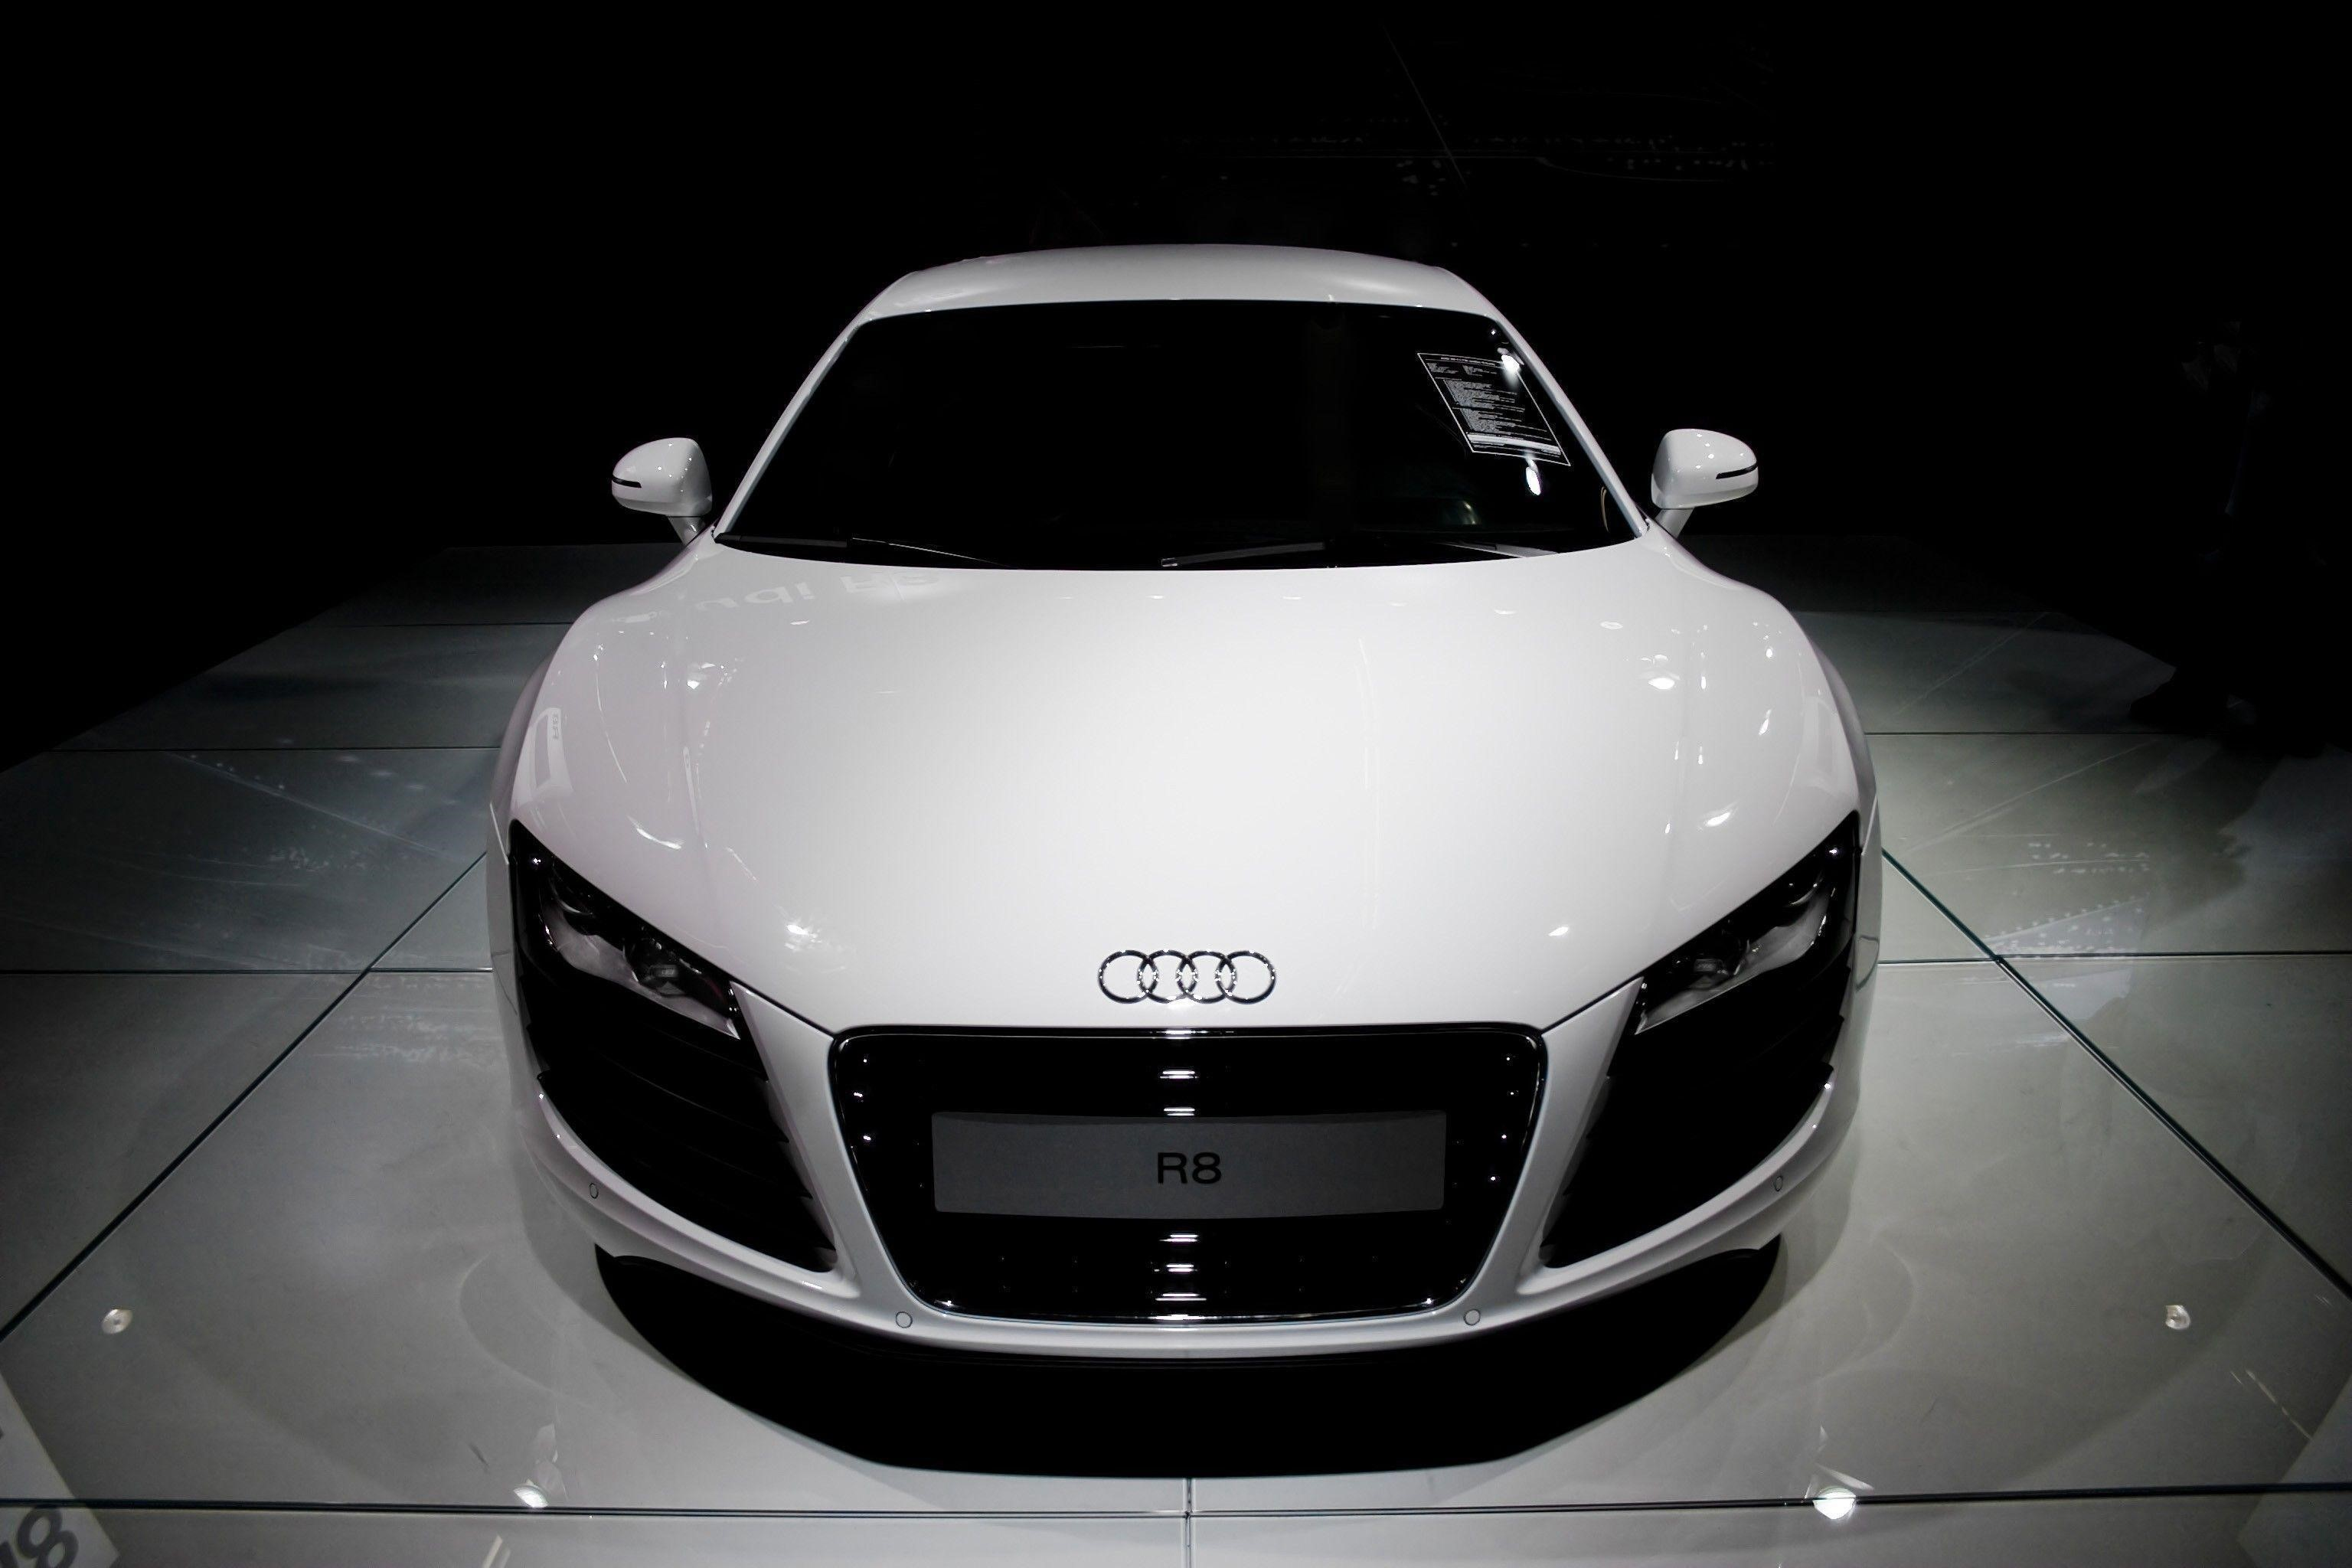 Audi R8 Windows Background